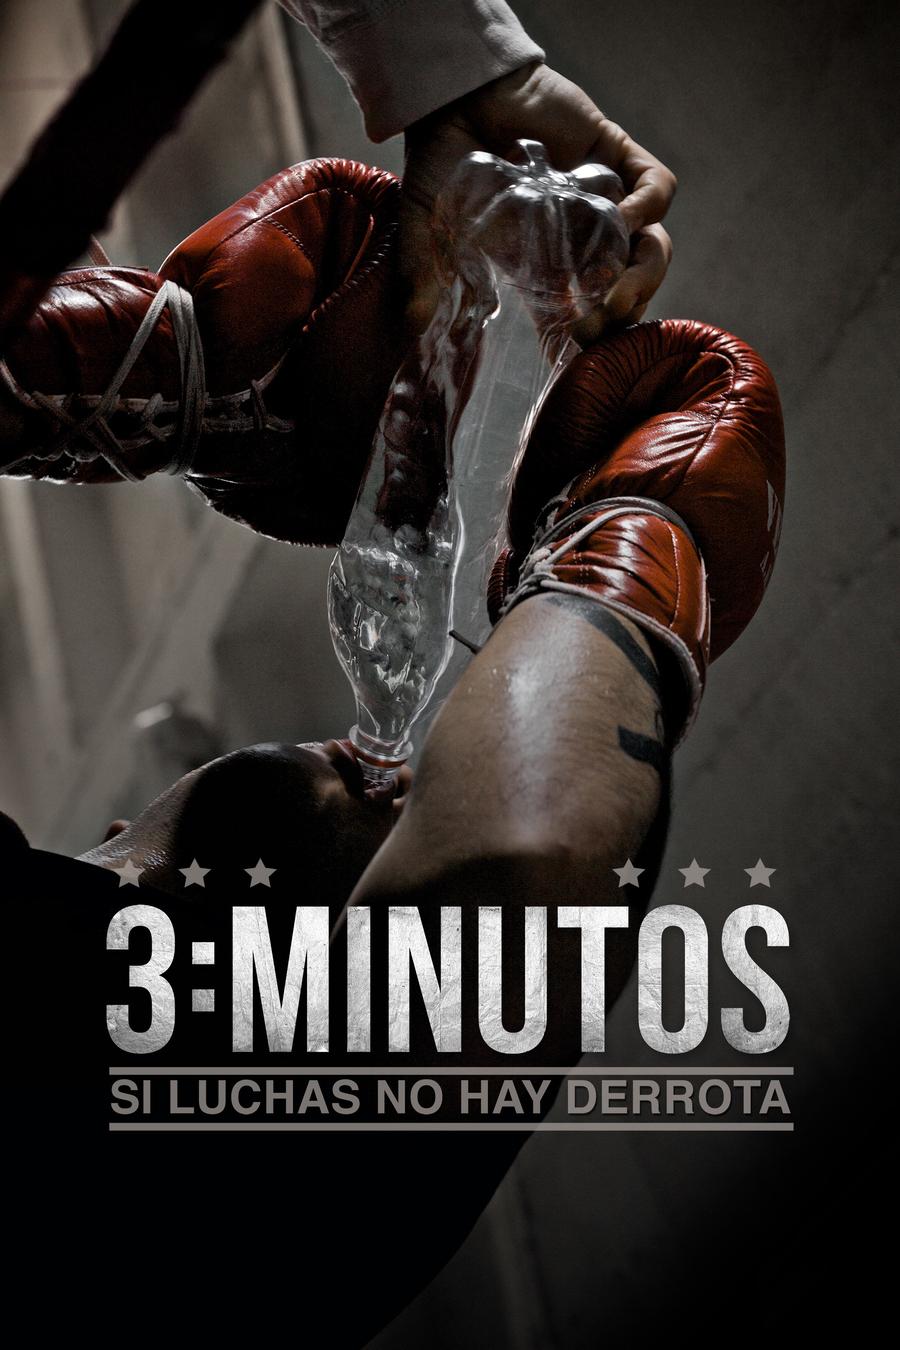 3 minutos (Si luchas no hay derrota)